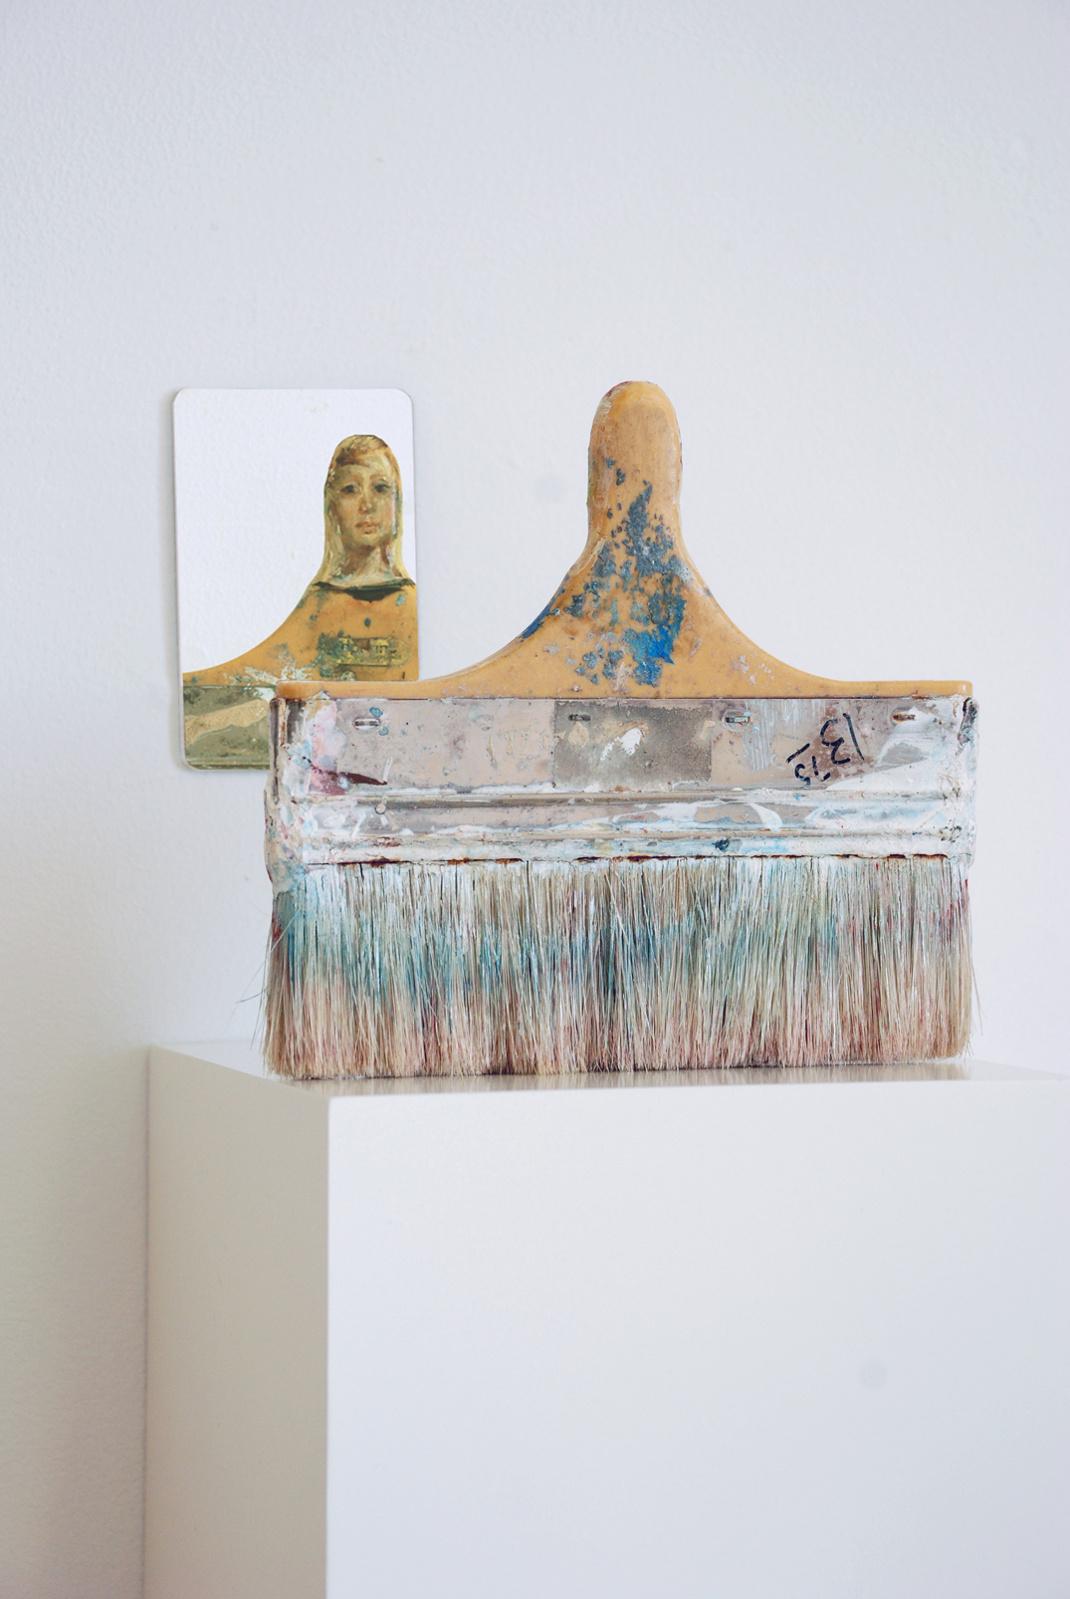 rebeccaszeto-ReflectionsonBeauty2